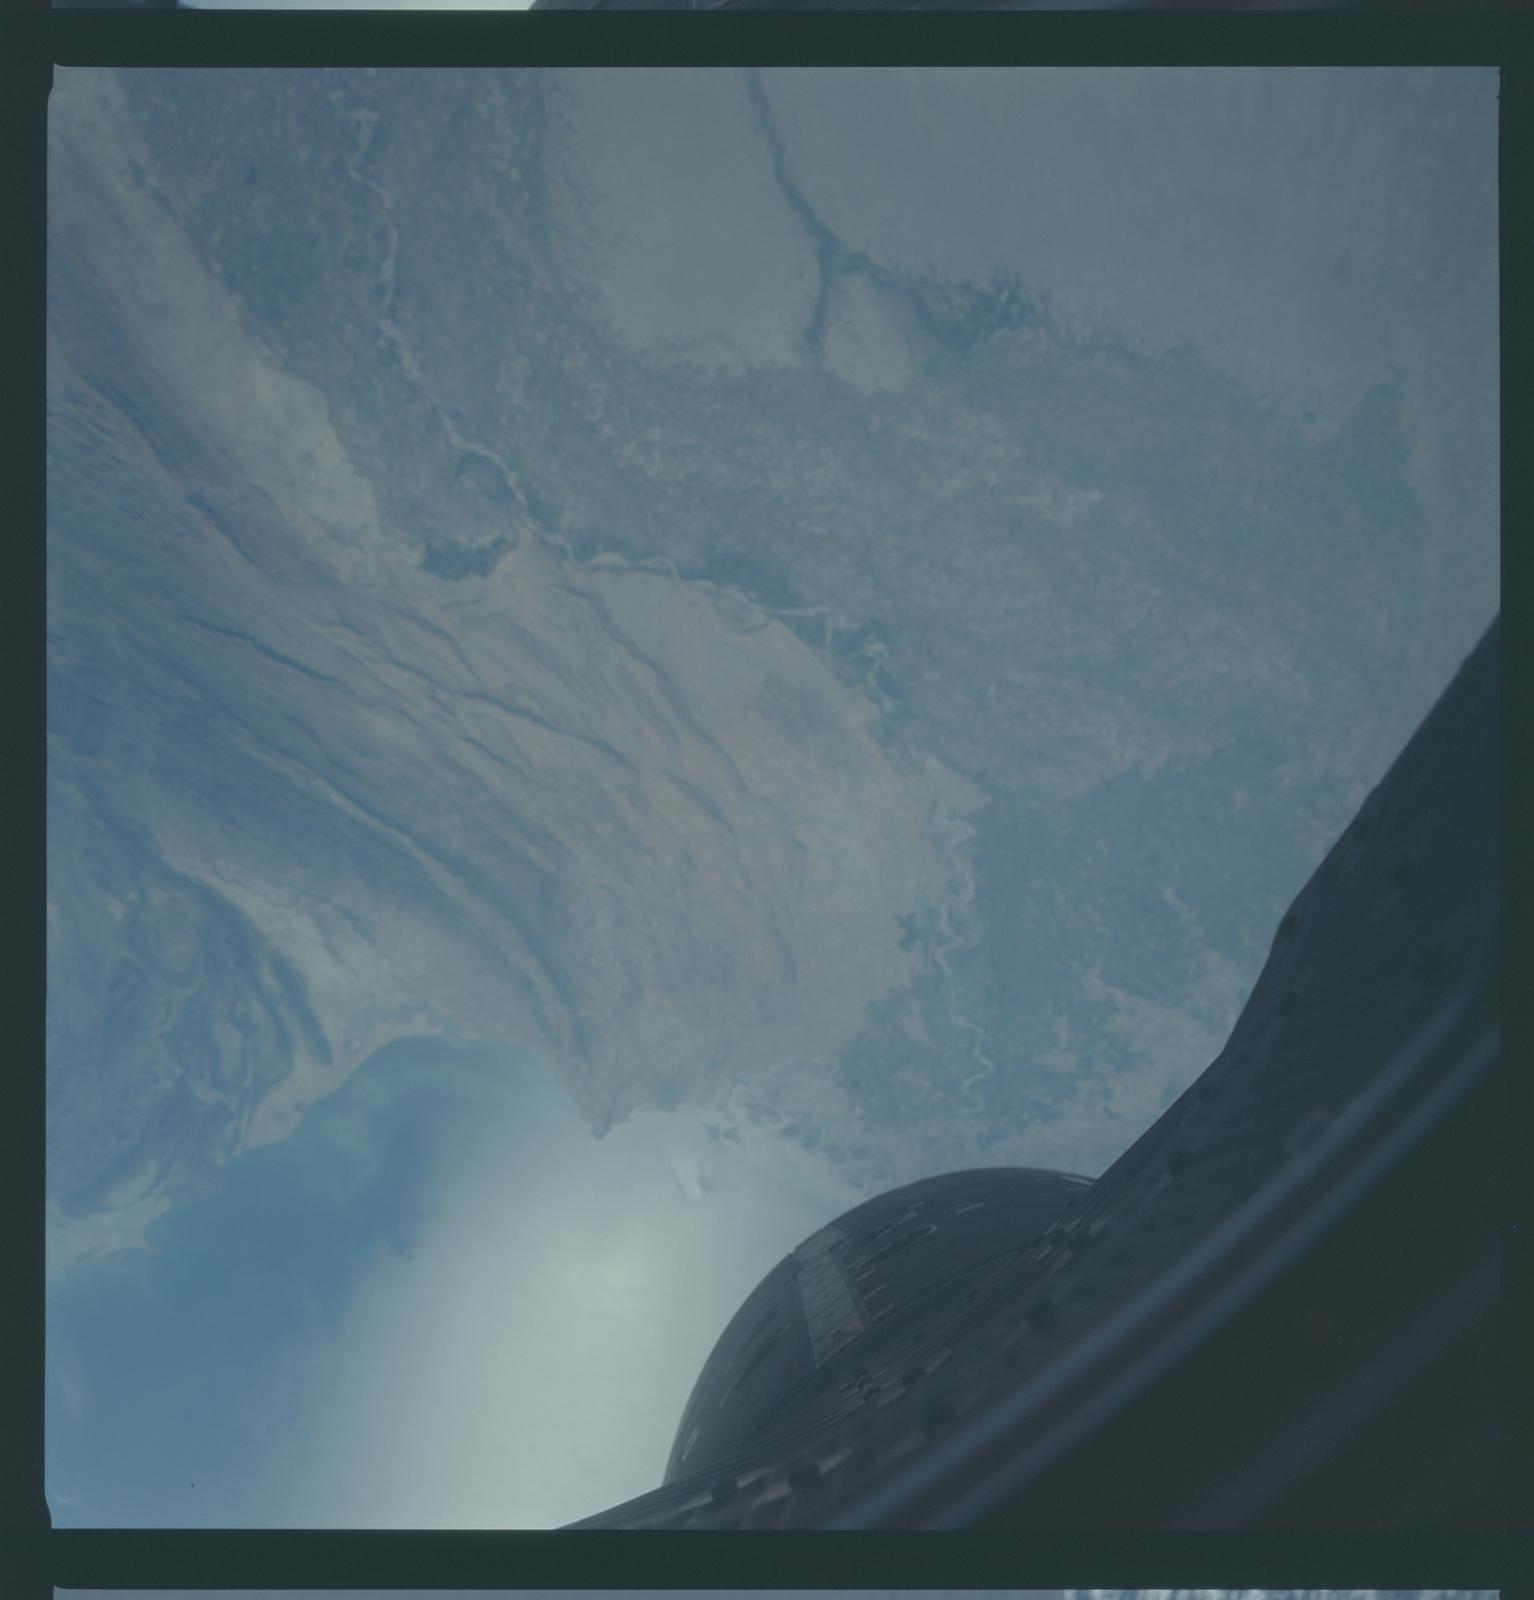 Gemini XII Mission Image - Pakistan